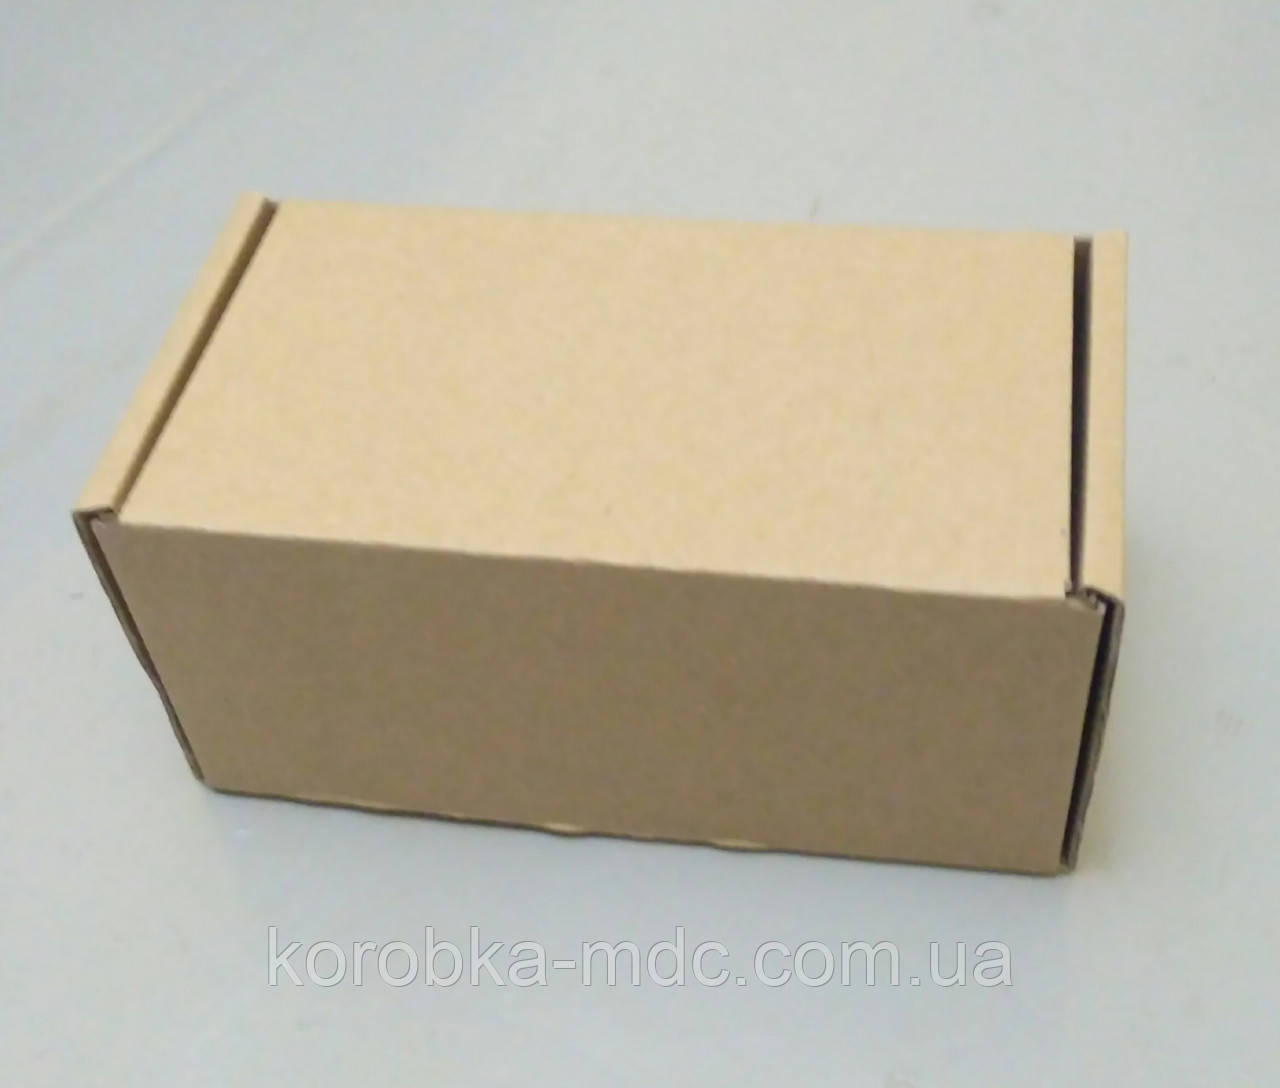 Коробка бурая 160х90х80 самосборная (шкатулка)